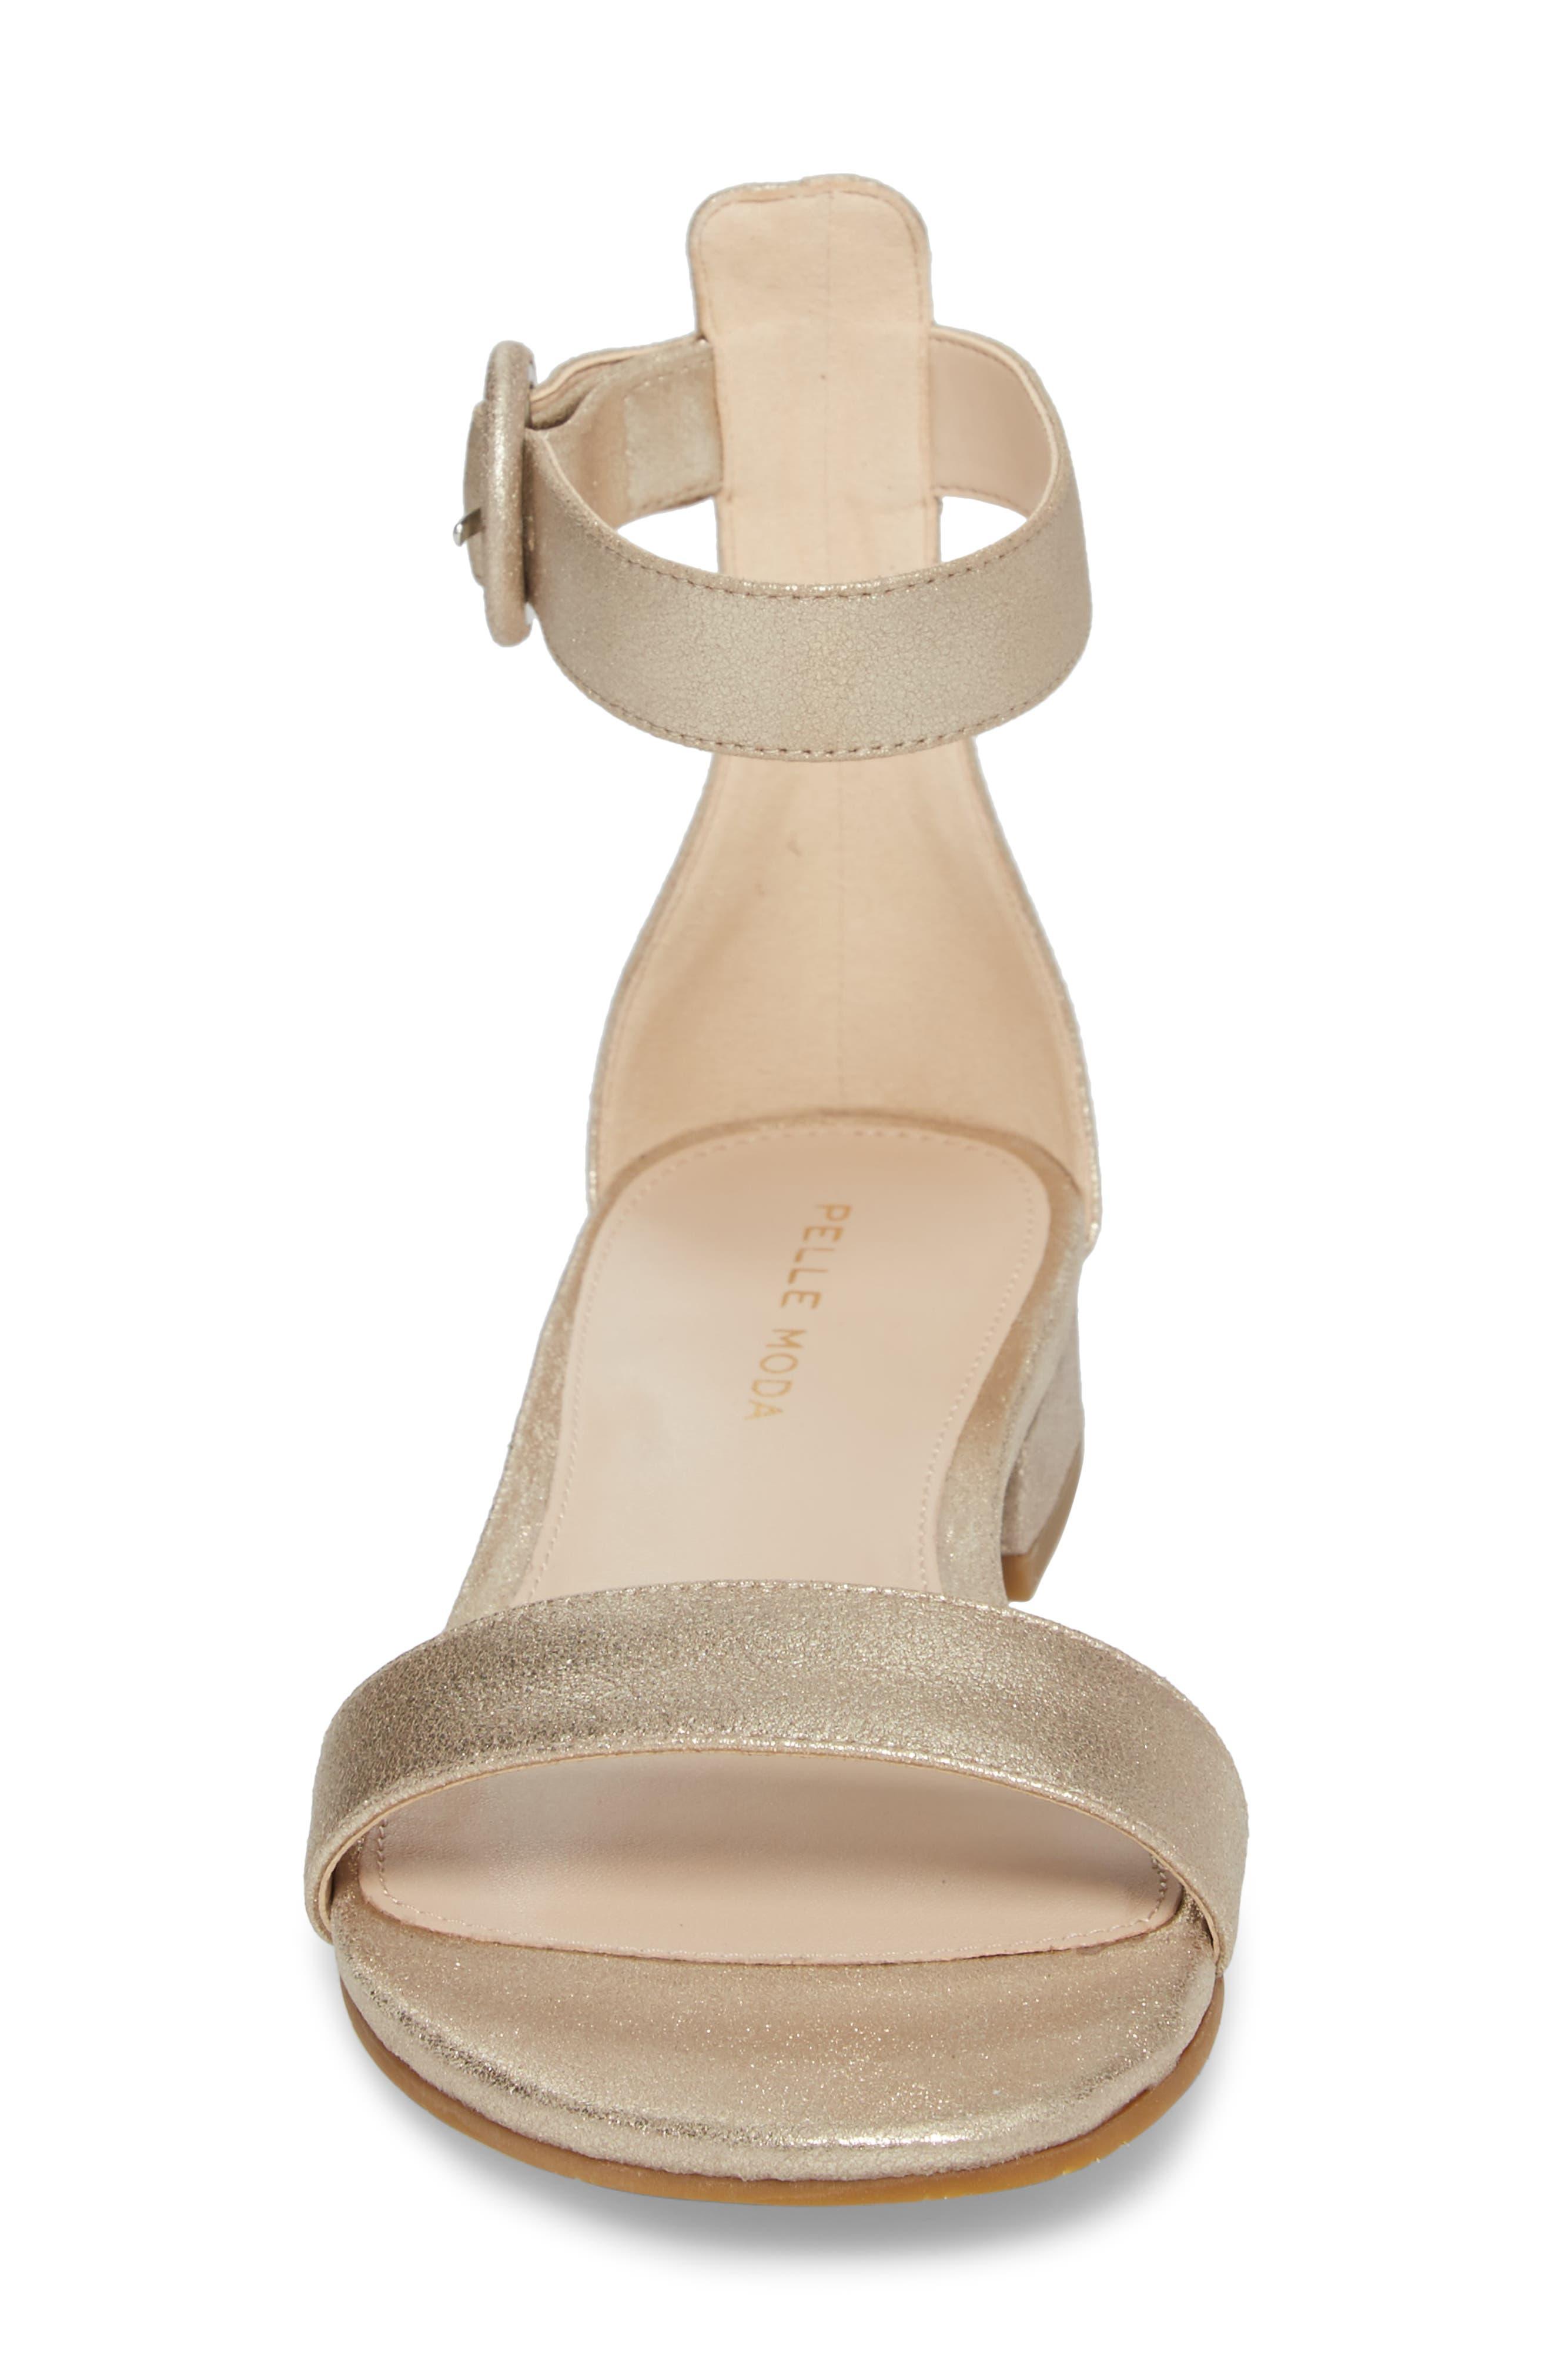 Newport Sandal,                             Alternate thumbnail 4, color,                             Platinum Gold Metallic Suede